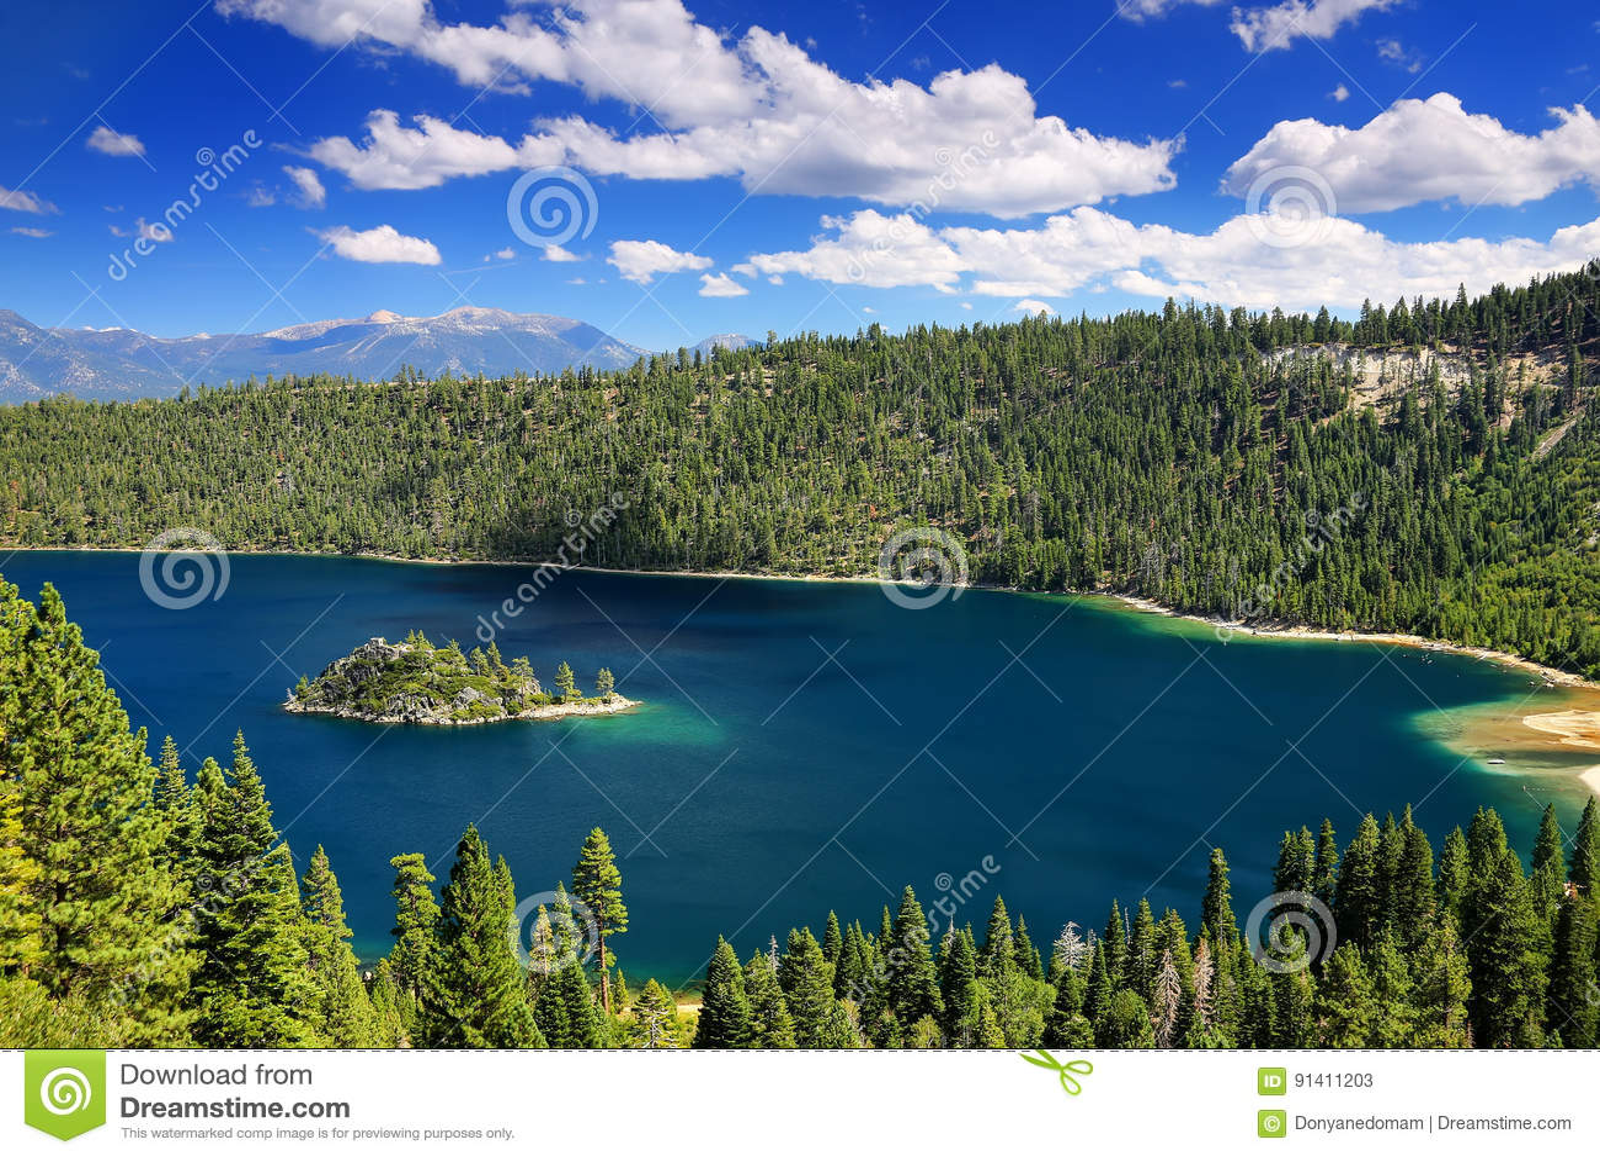 Fannette Island em Emerald Bay em Lake Tahoe, Califórnia, EUA